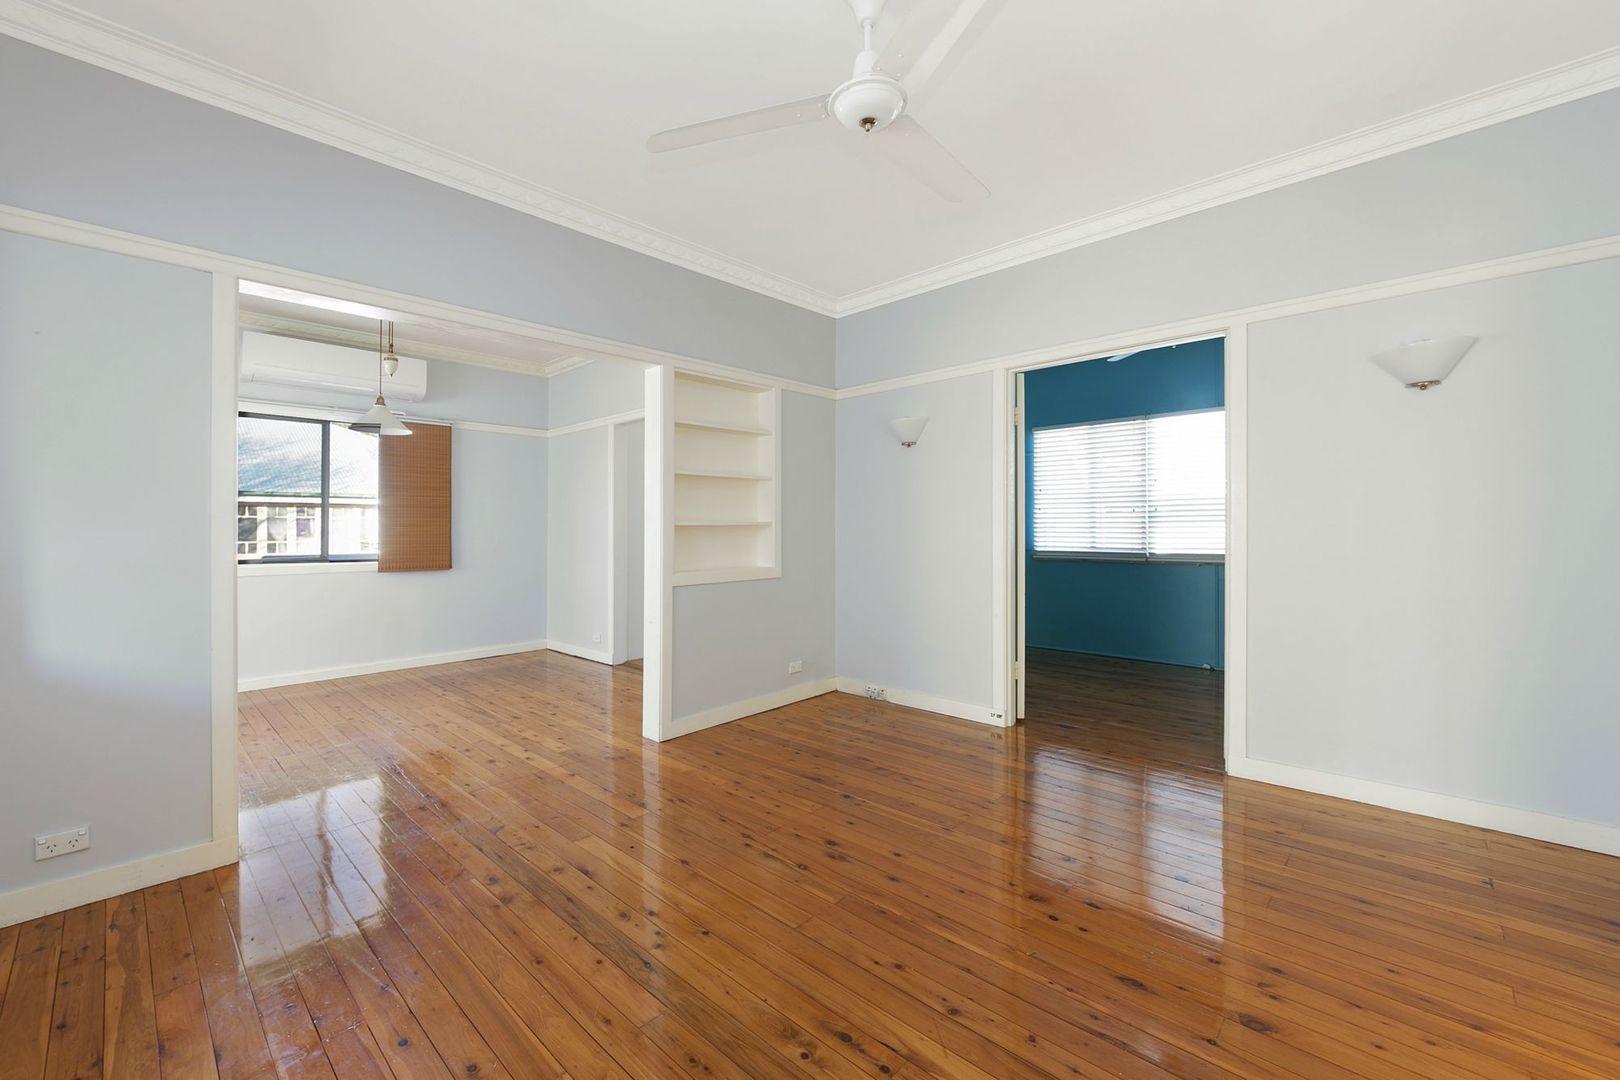 3/77 Forest Street, Moorooka QLD 4105, Image 2